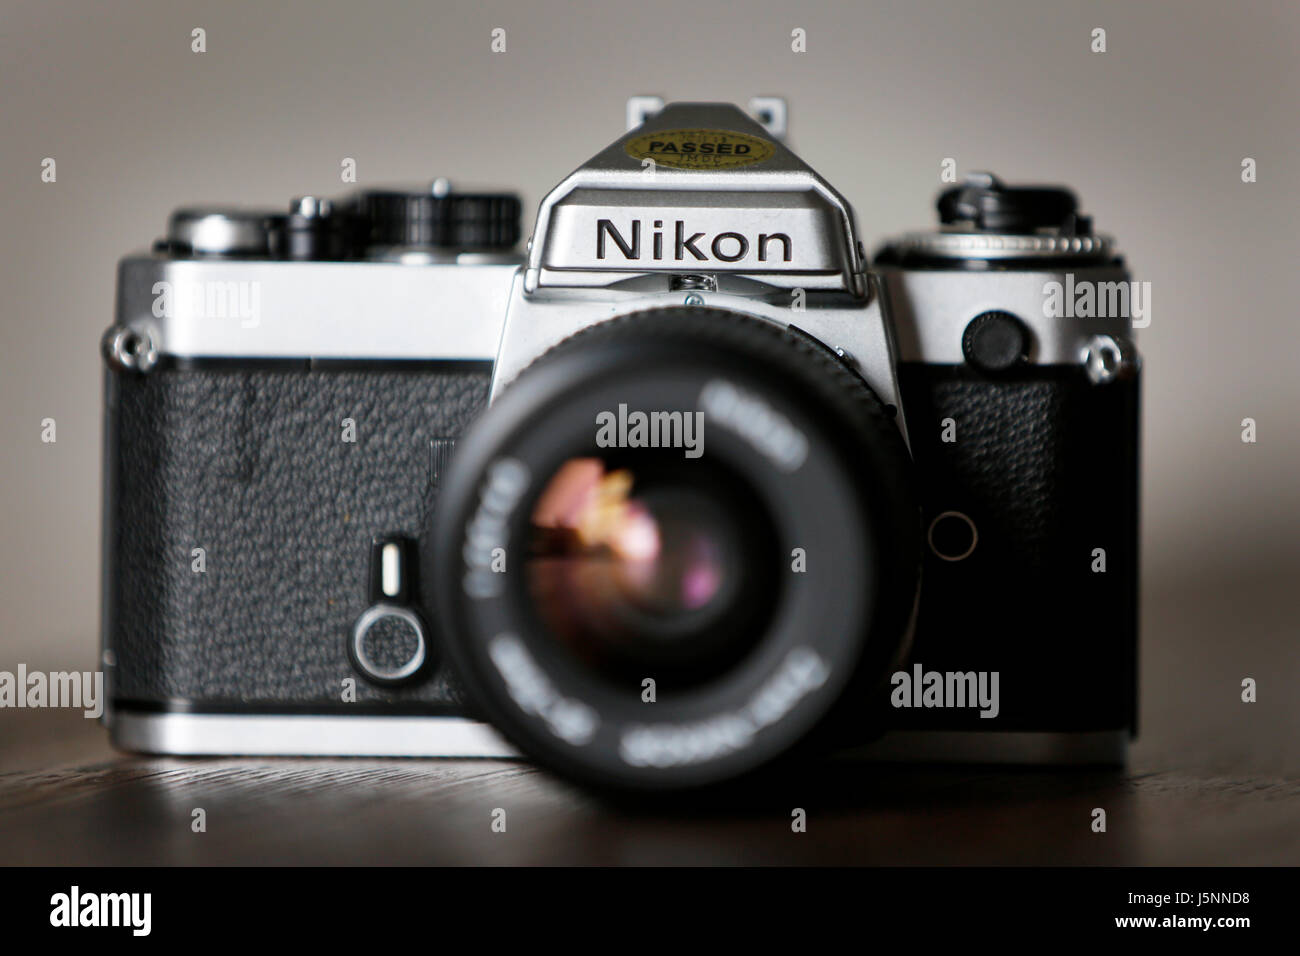 Vintage Nikon FE Single Lens Reflex 35mm Film Camera - Stock Image